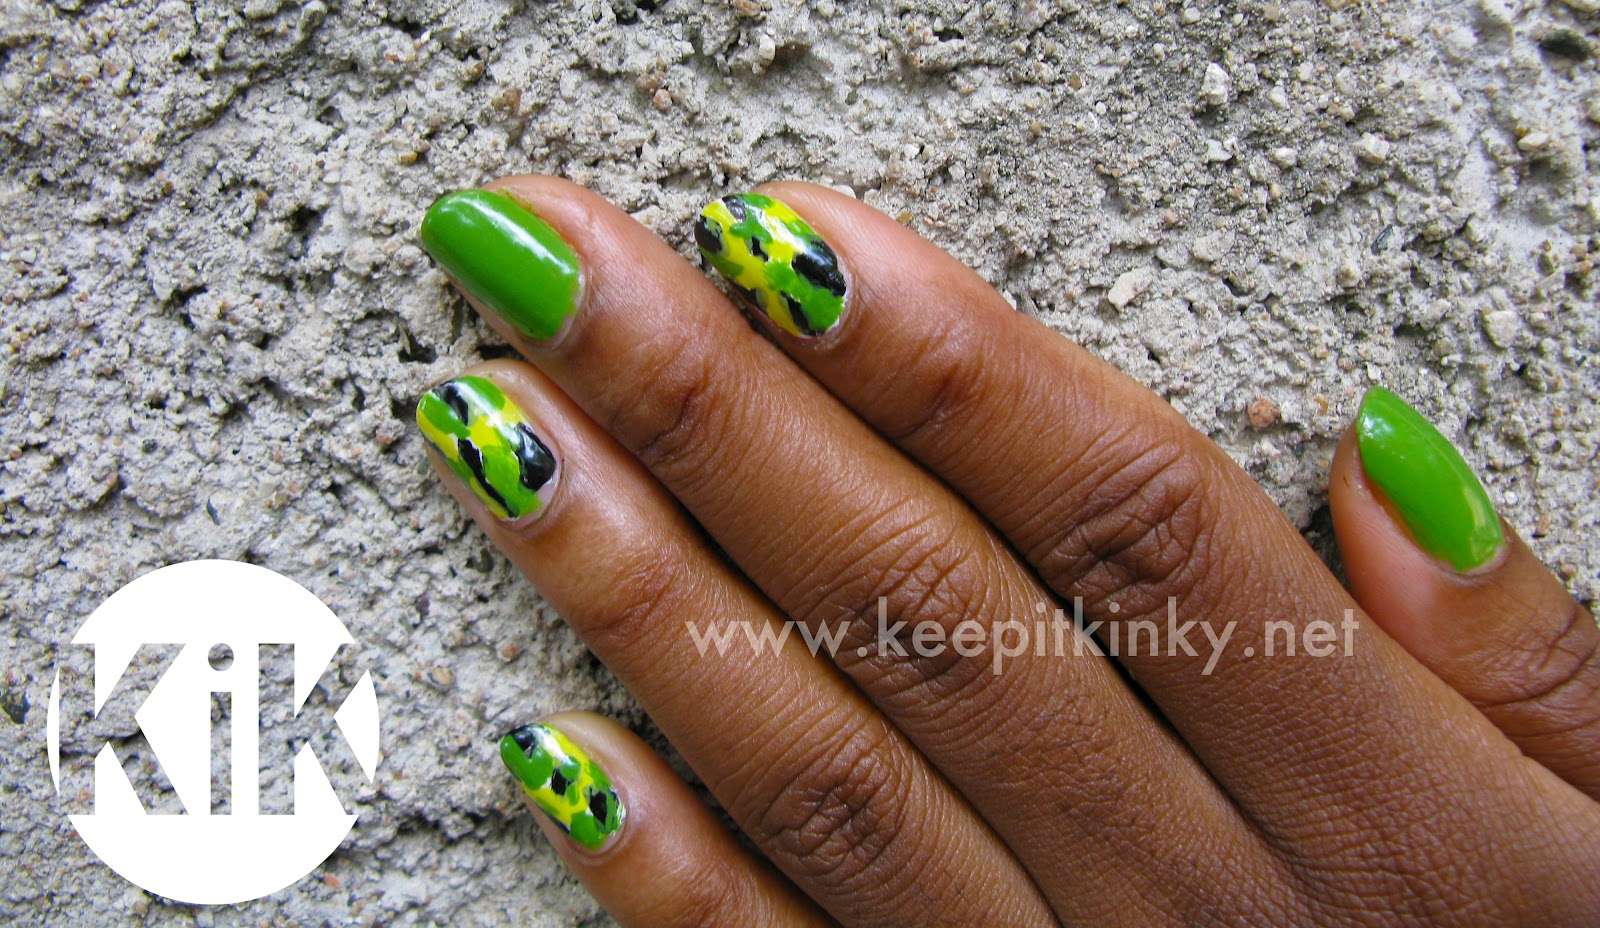 Jamaica Inspired Nail Art | Look 2 KiK Nail Art Challenge -